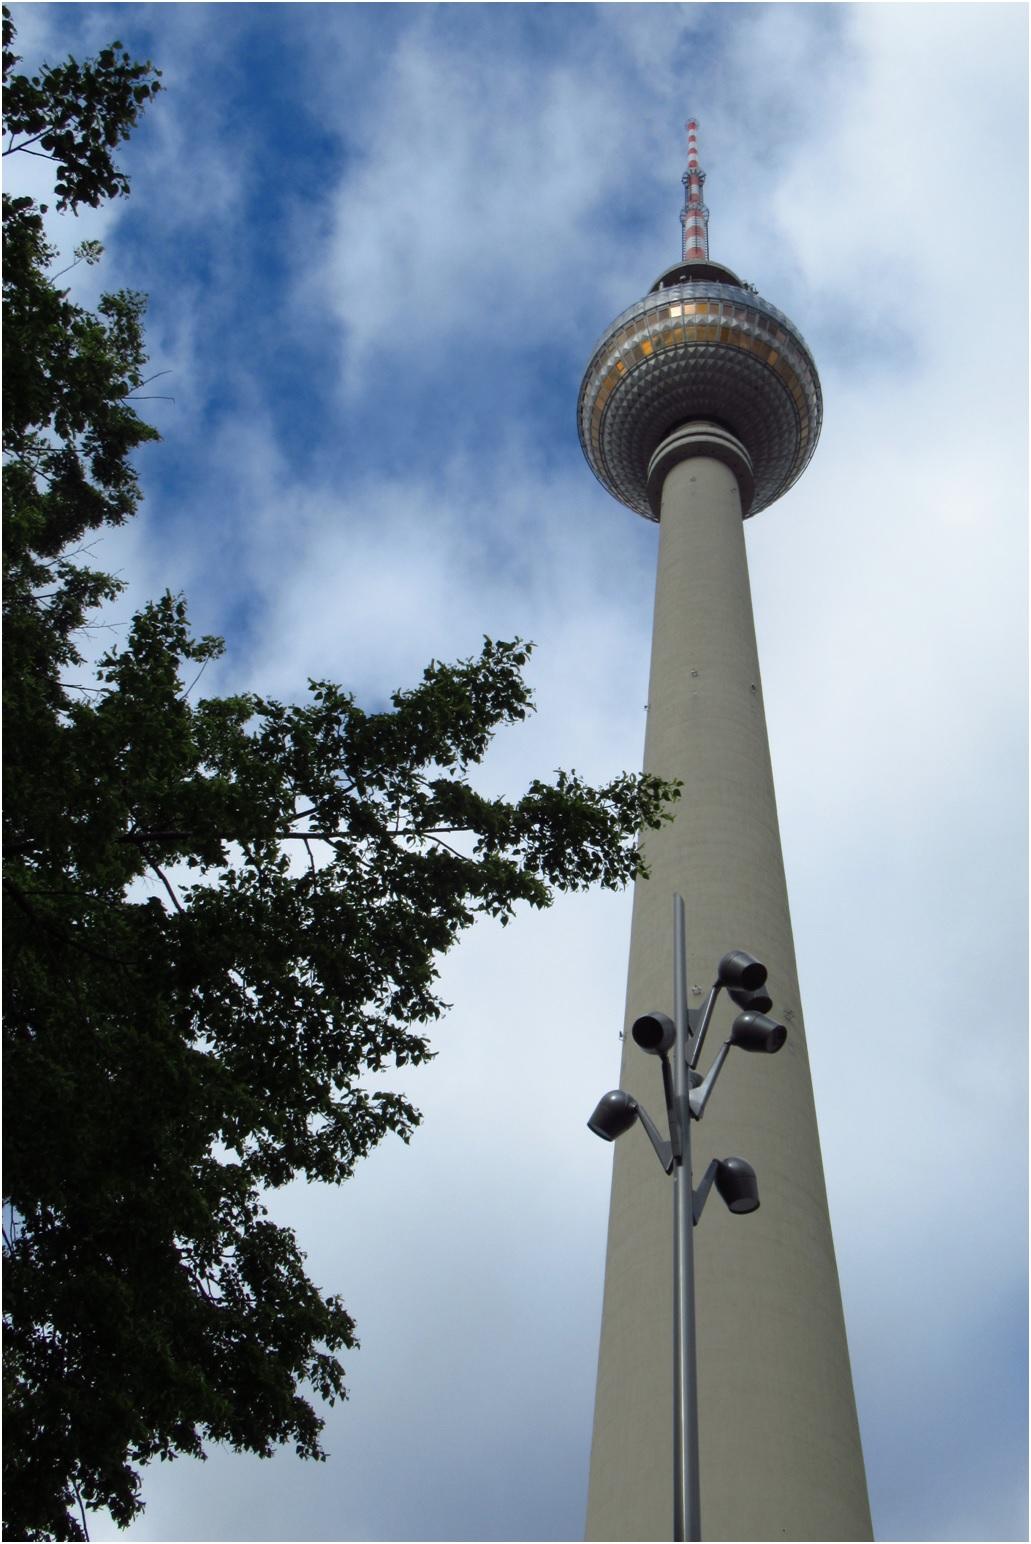 Alexanderplatz Tower